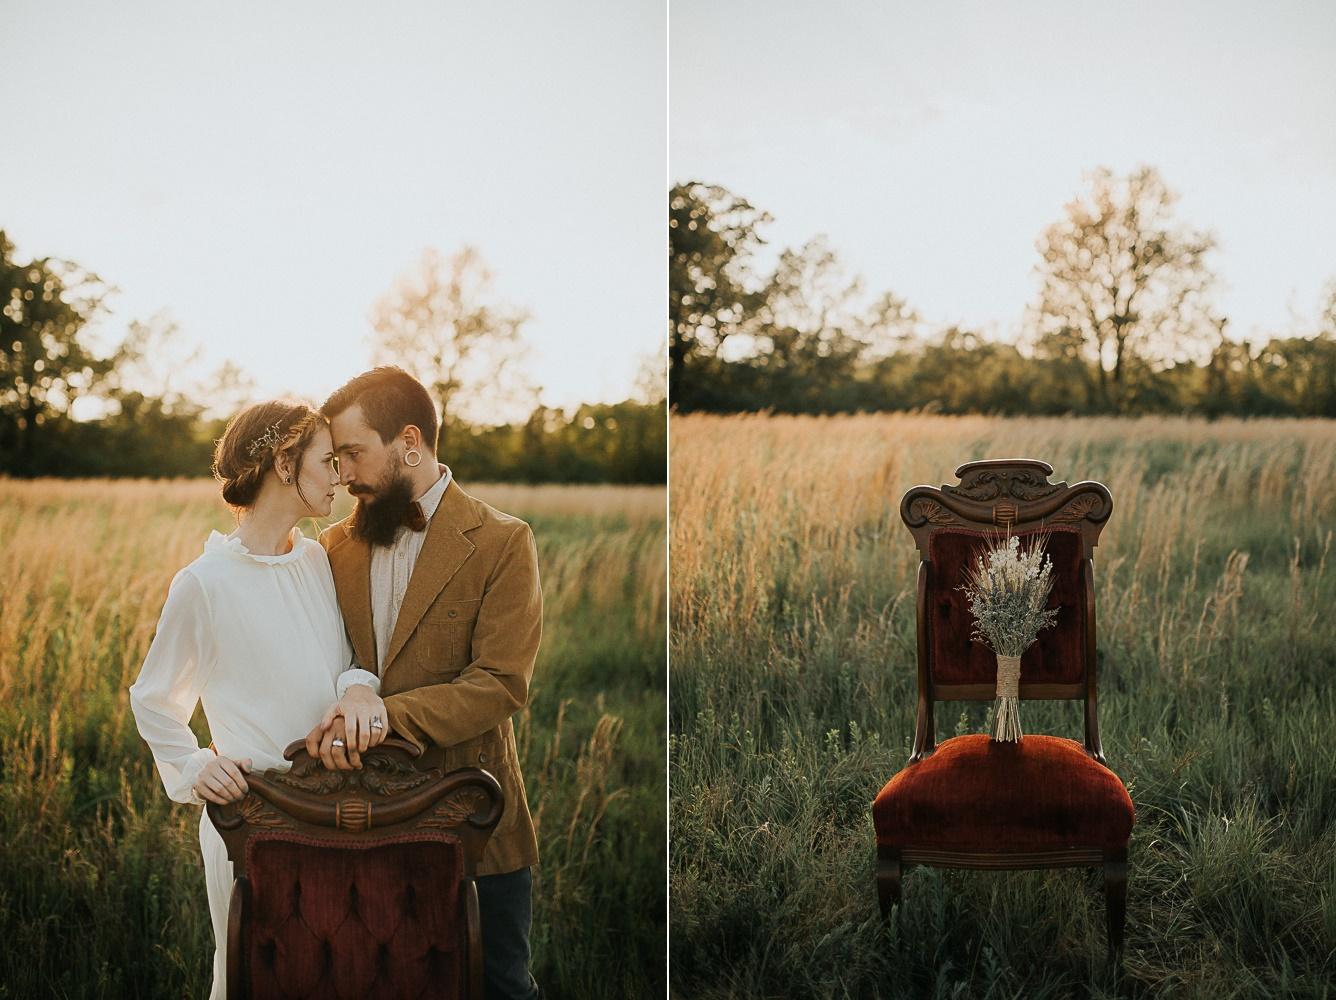 Cassie Cook Photography-Memphis TN-portrait and wedding photographer -7065-horz.jpg